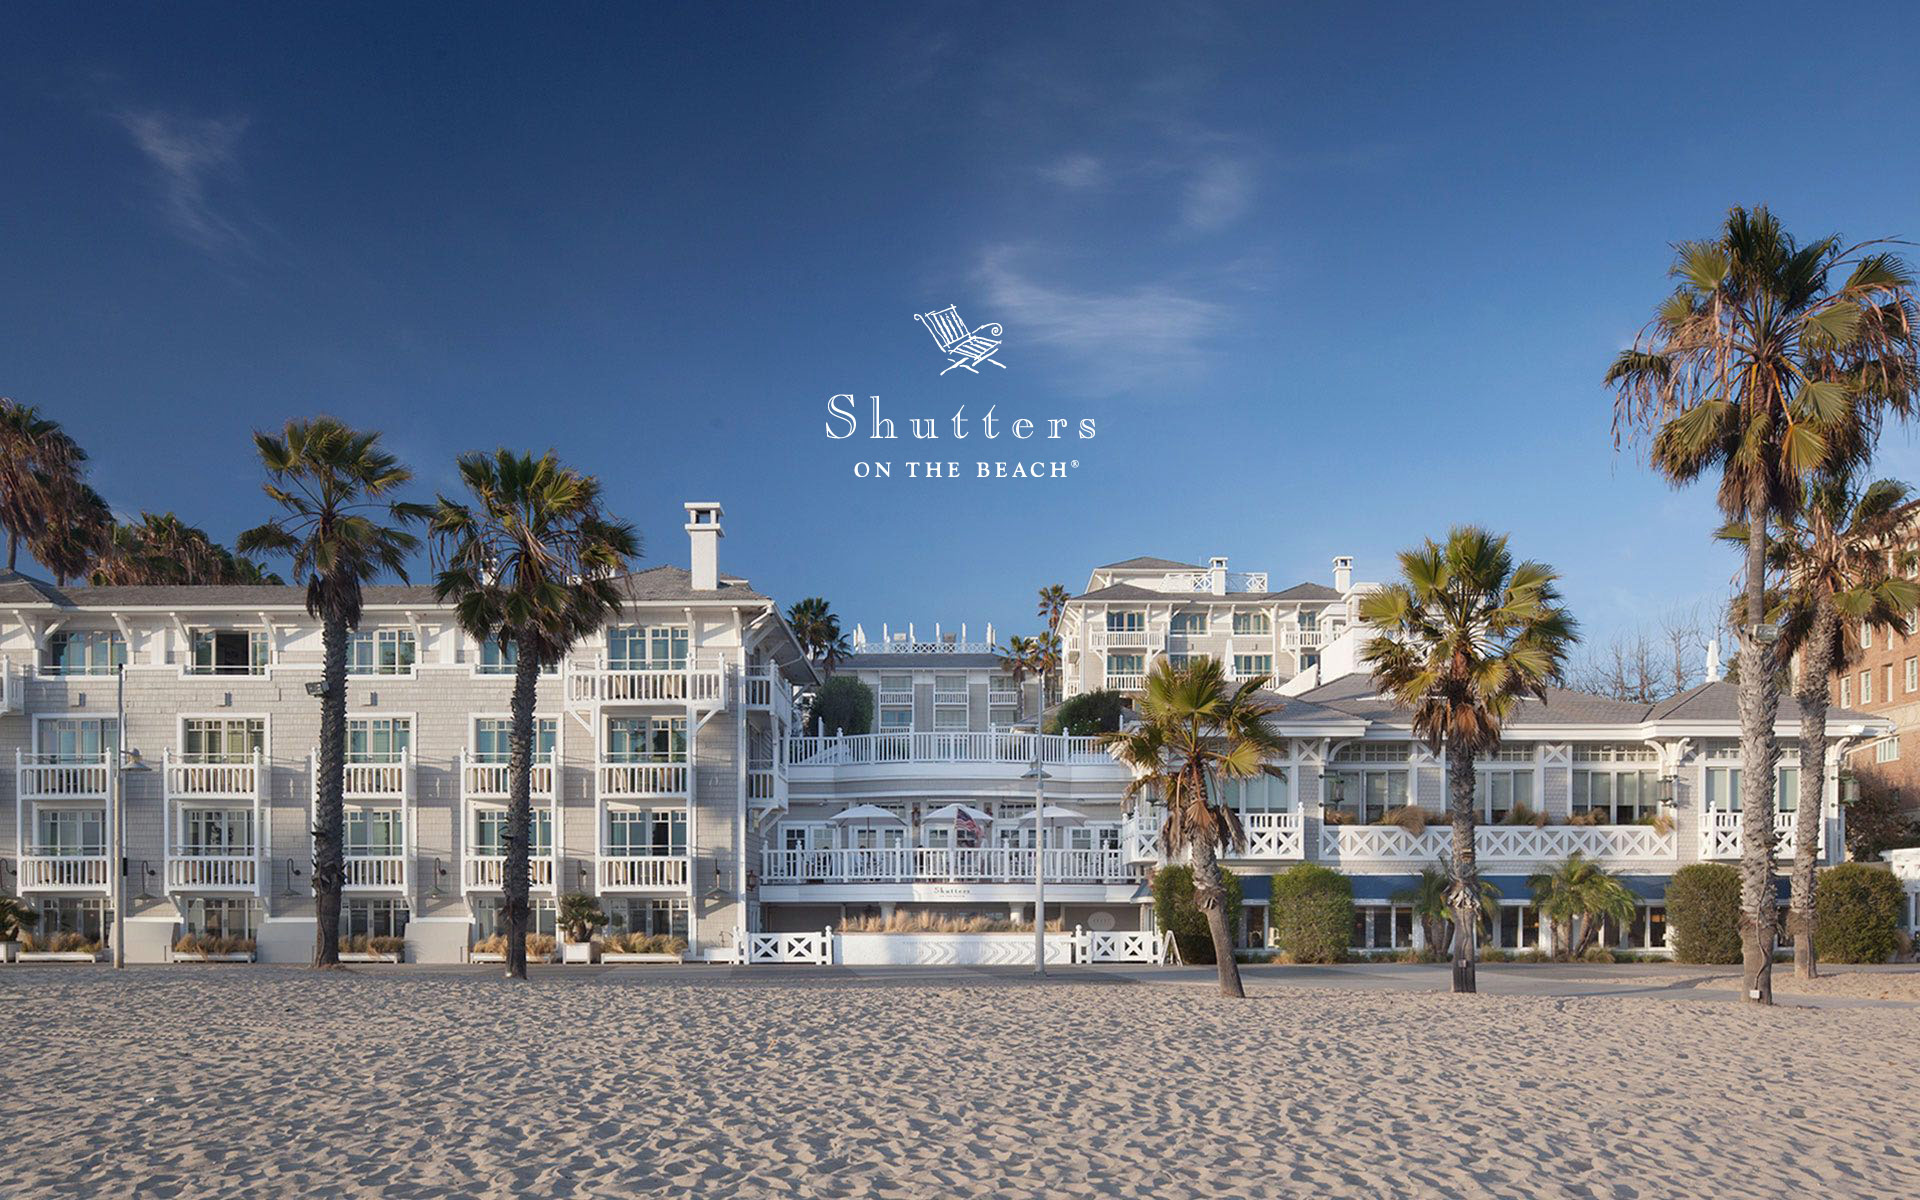 Santa Monica Hotel - Luxury Beach Hotel | The Iconic Shutters on the